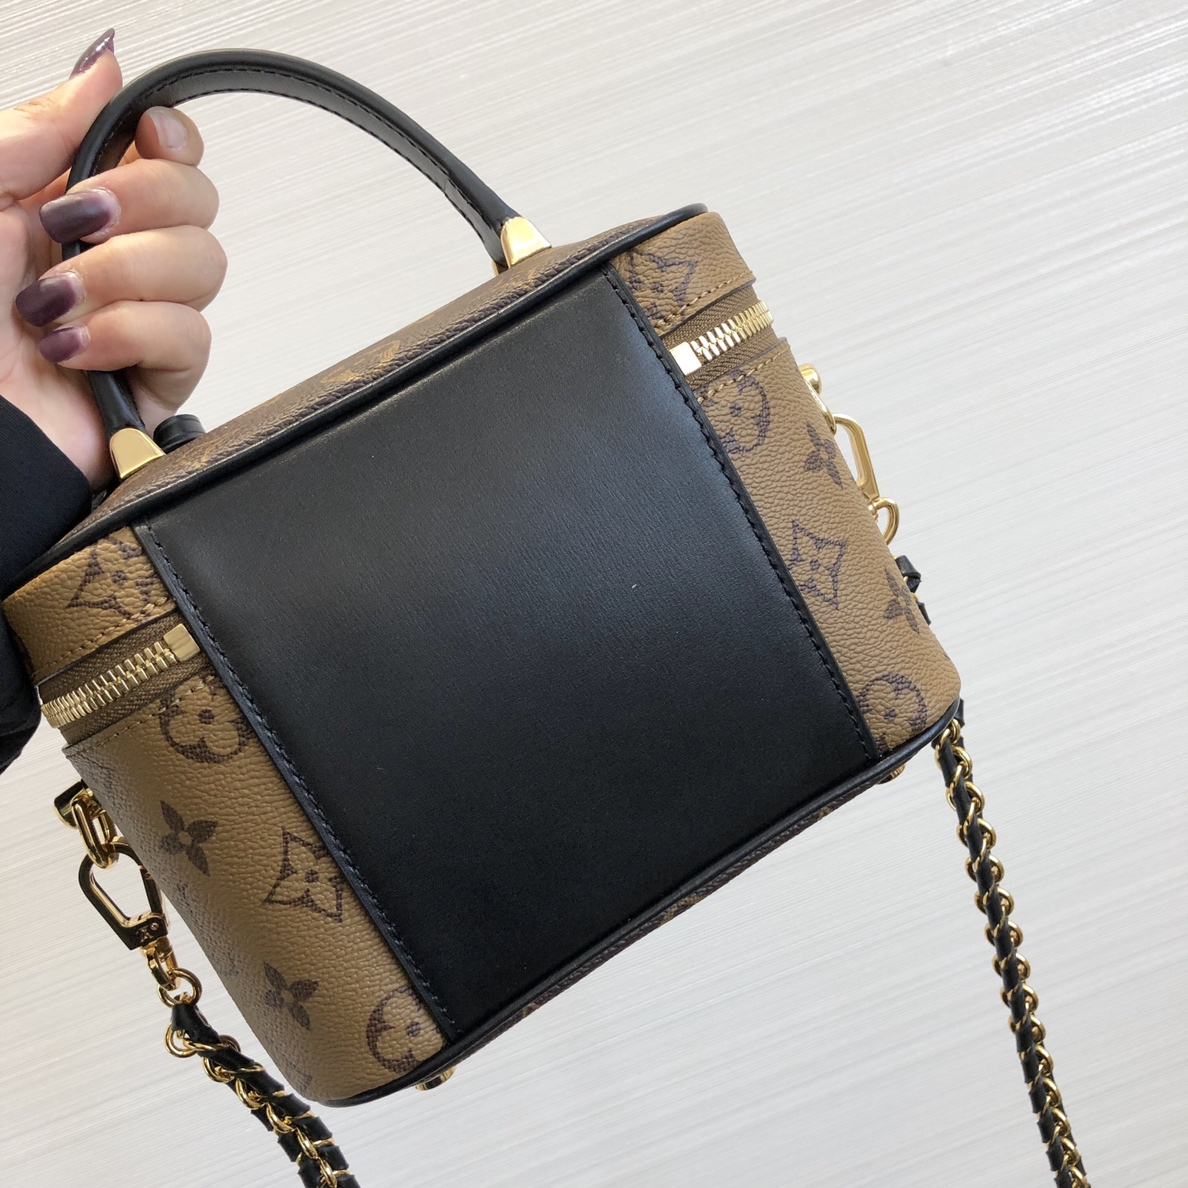 LV包包 2020春夏新款复古风化妆箱包50138 全新链条设计超级酷